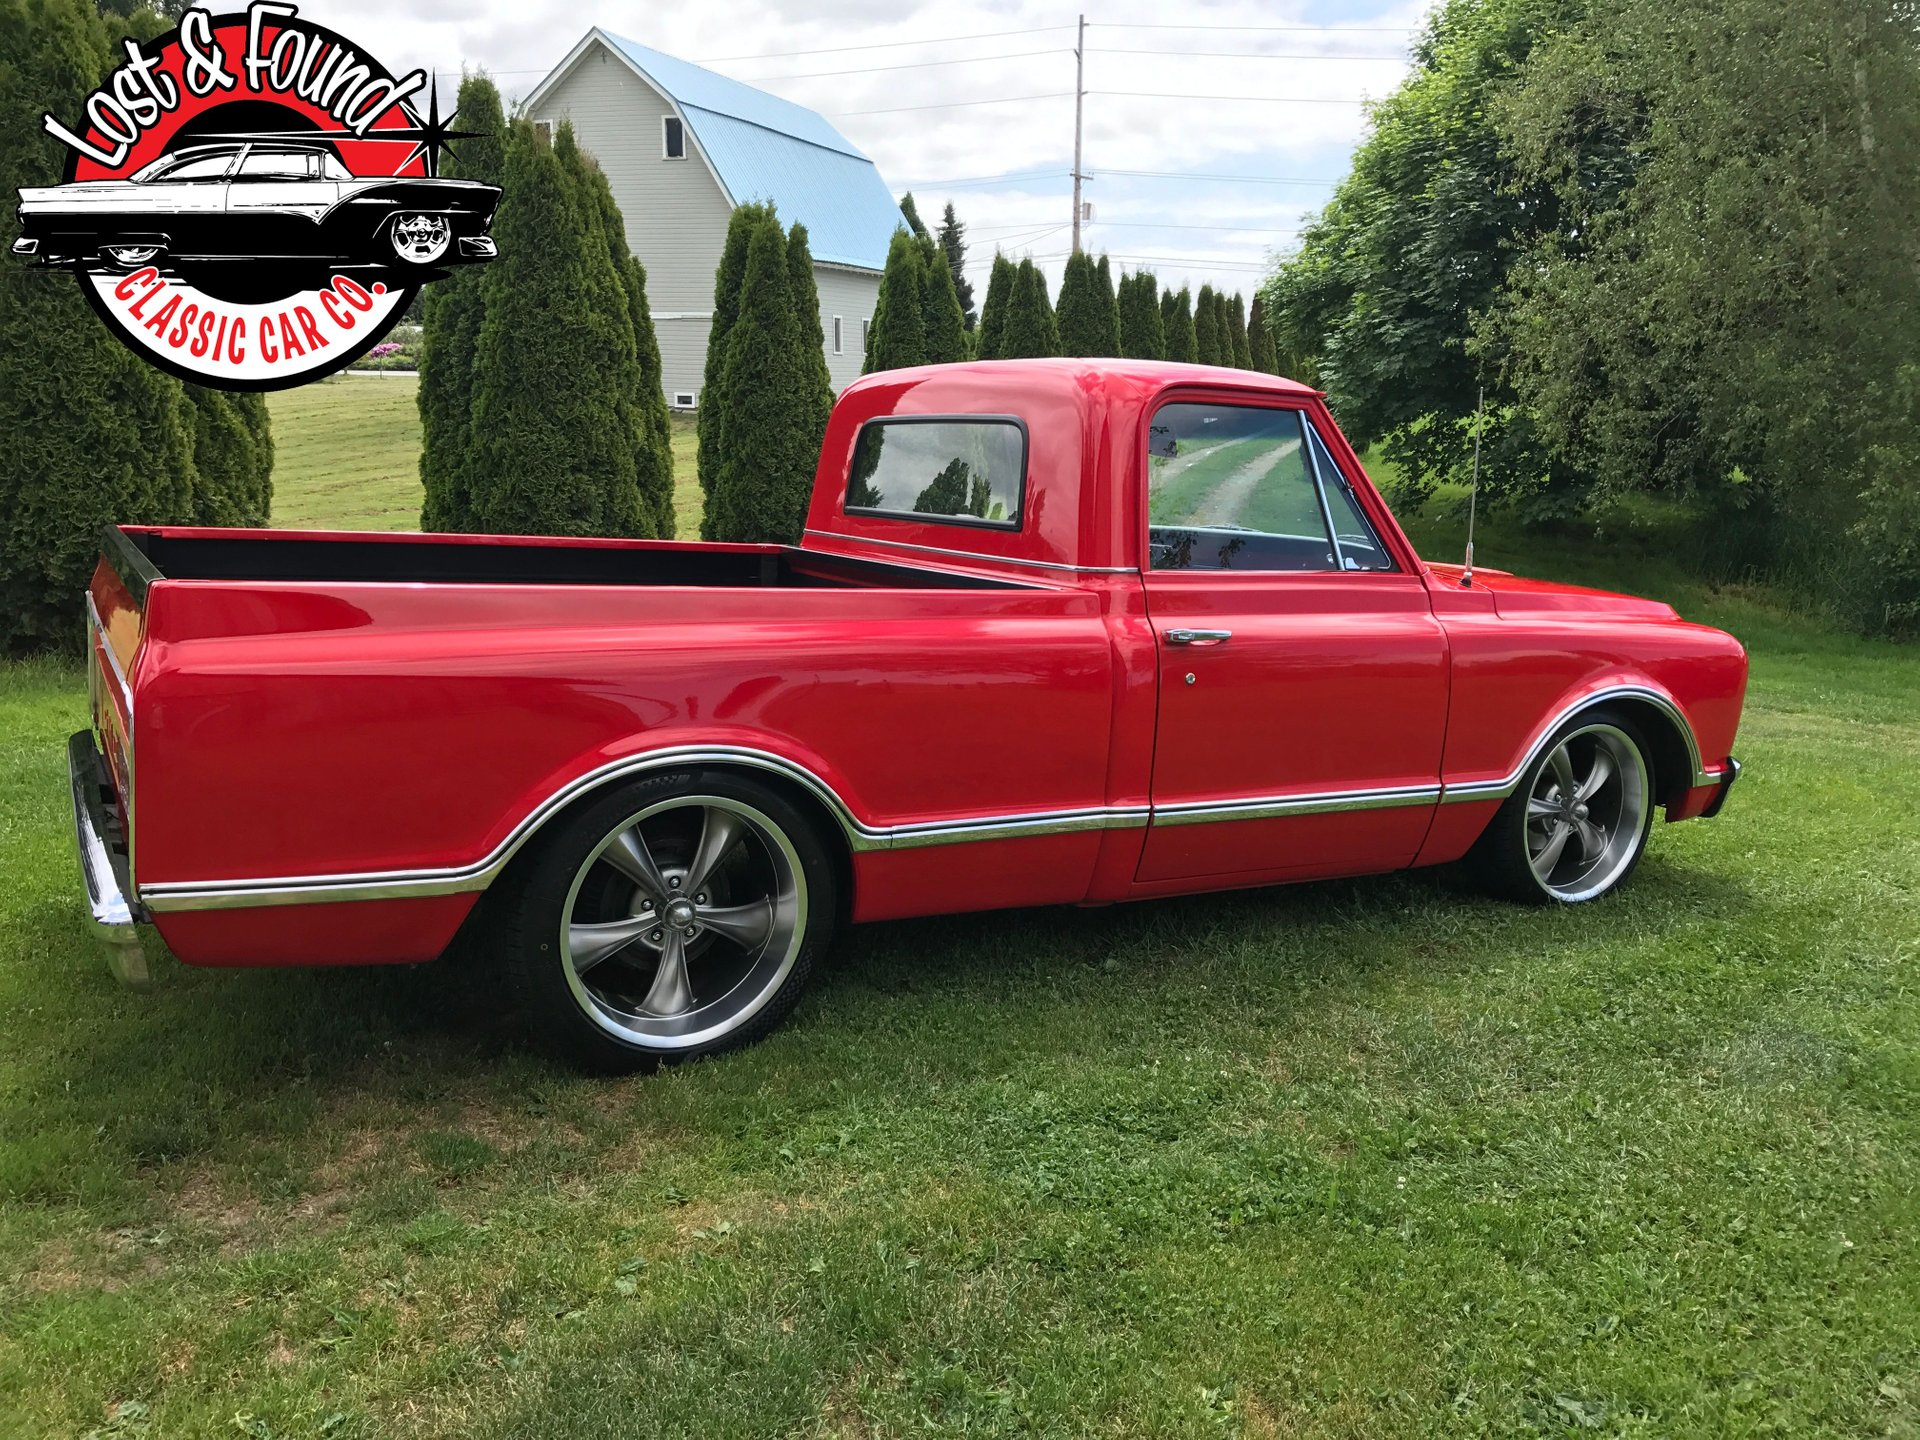 1967 GMC Short Box Pickup truck C10 for sale #89496 | MCG